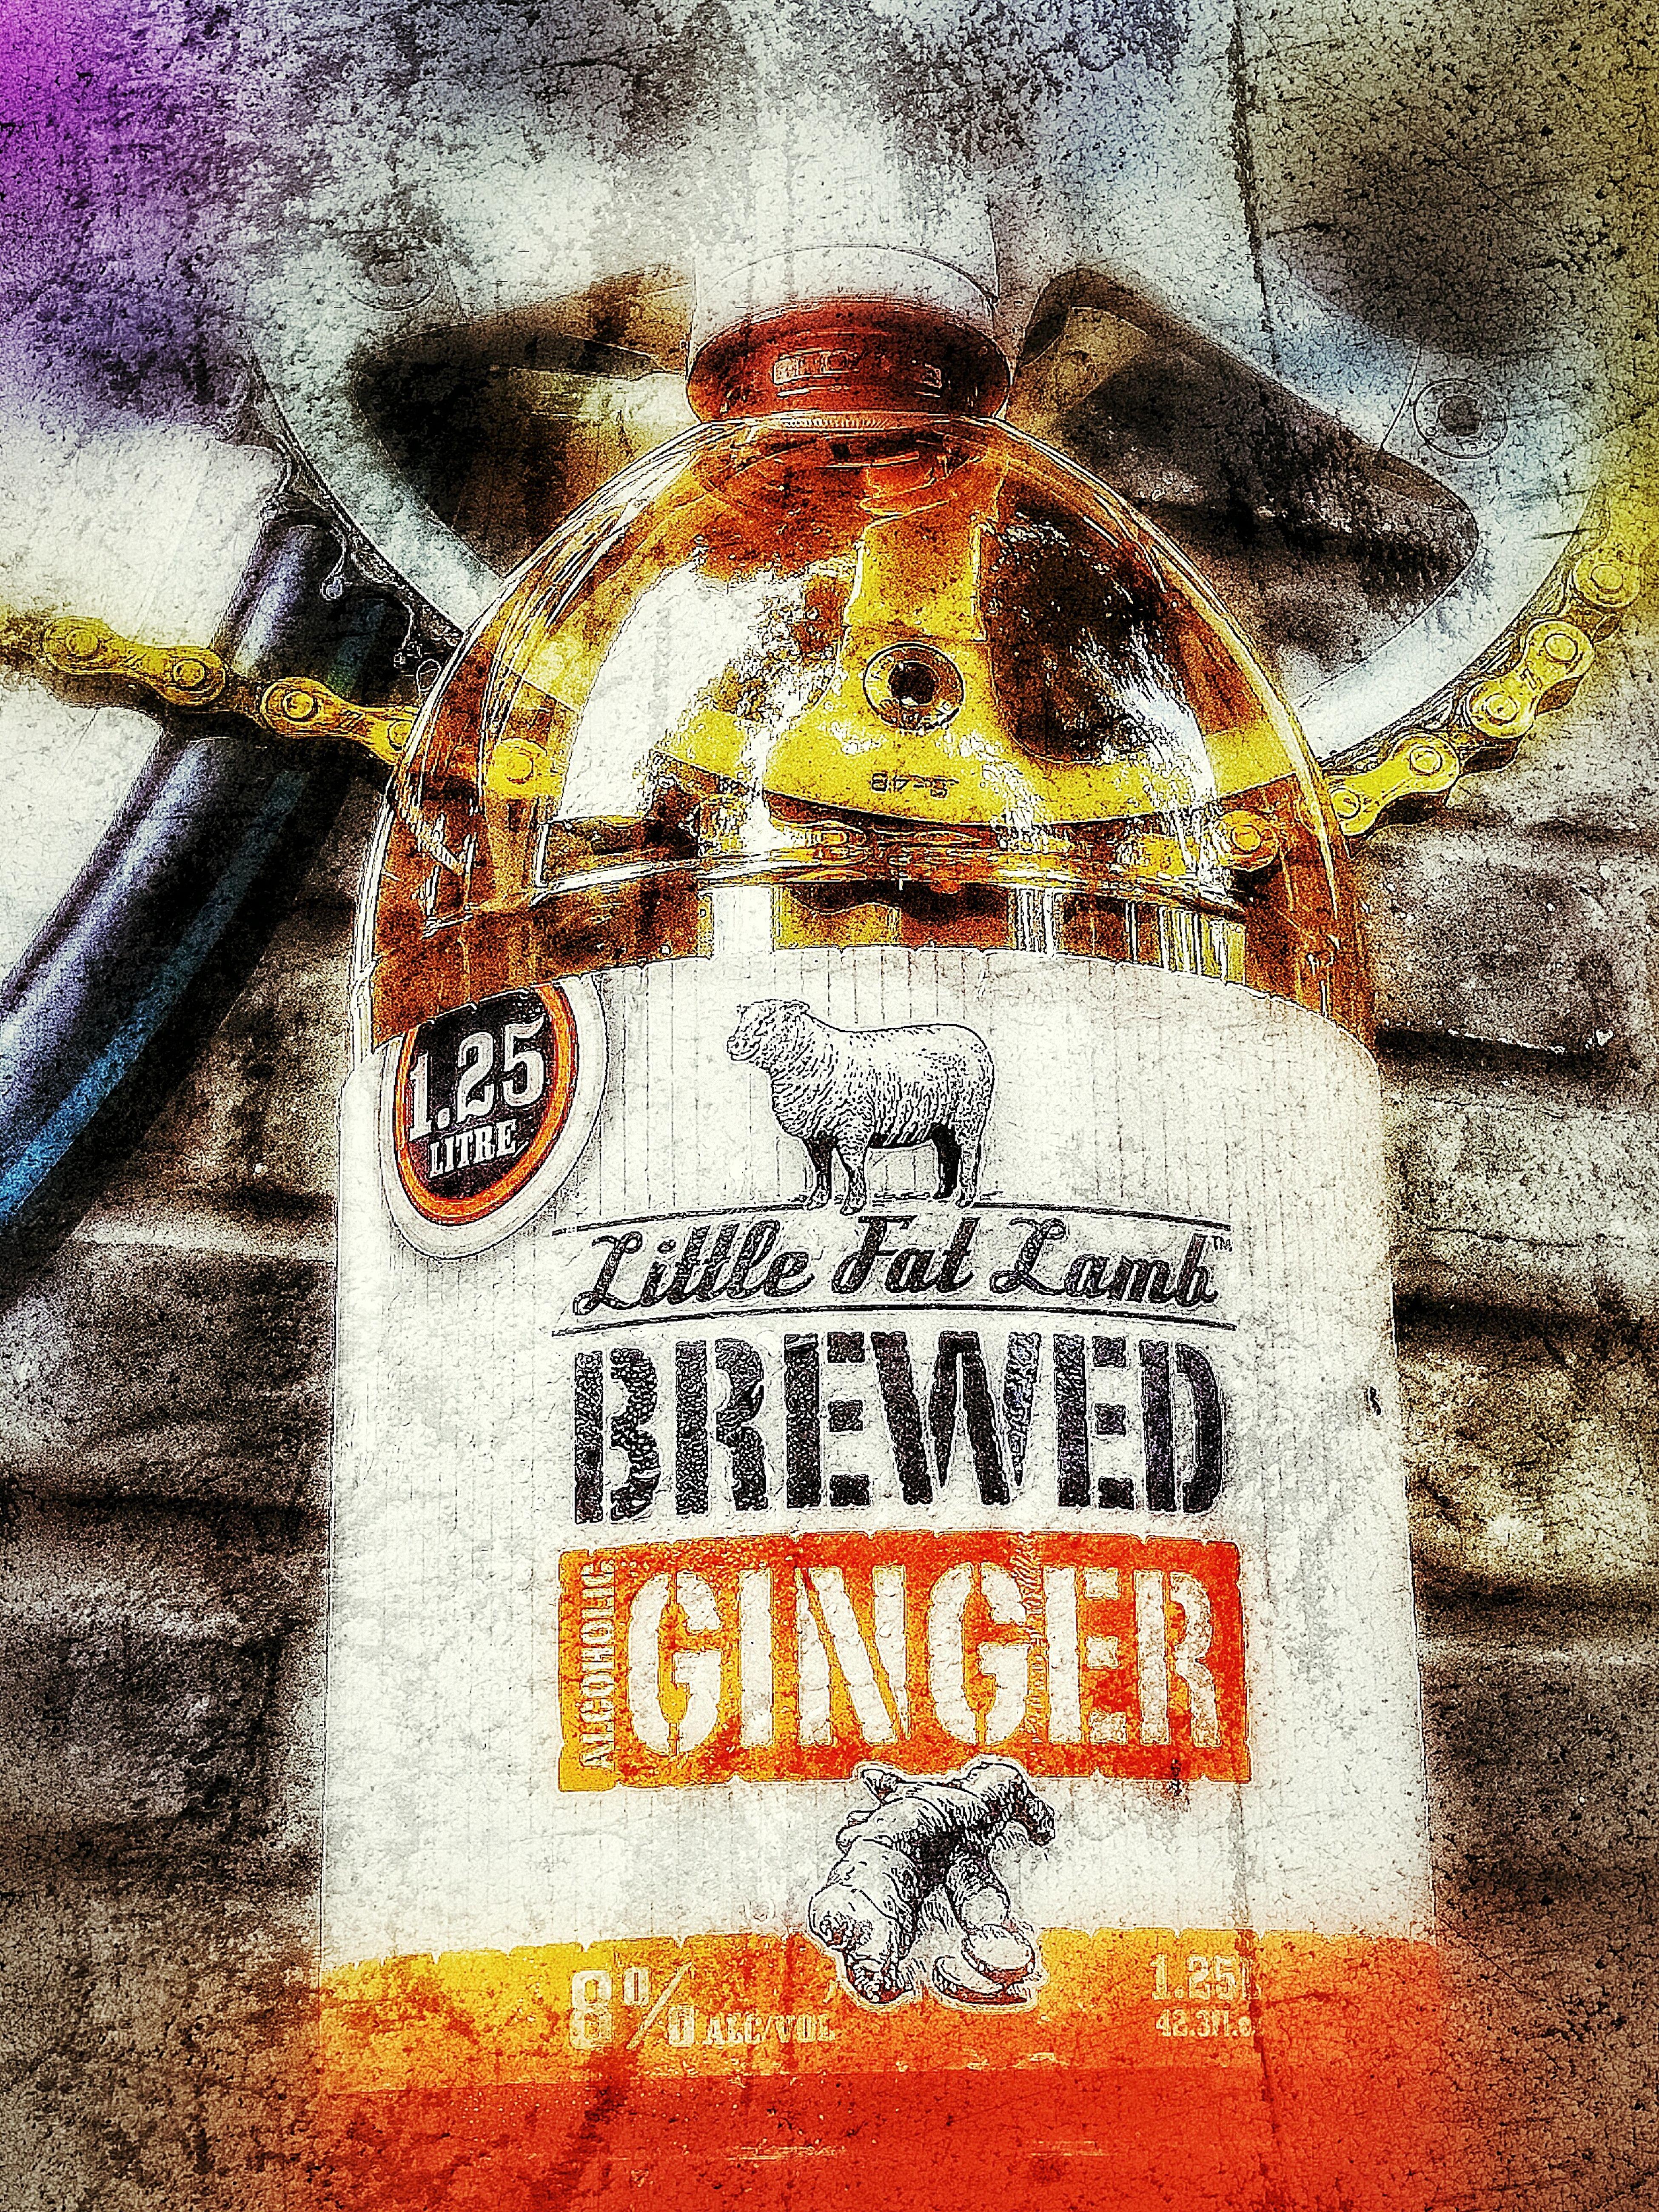 Little Fat Lamb Alcholic Beverage Ginger Beer Close-up Fixieporn